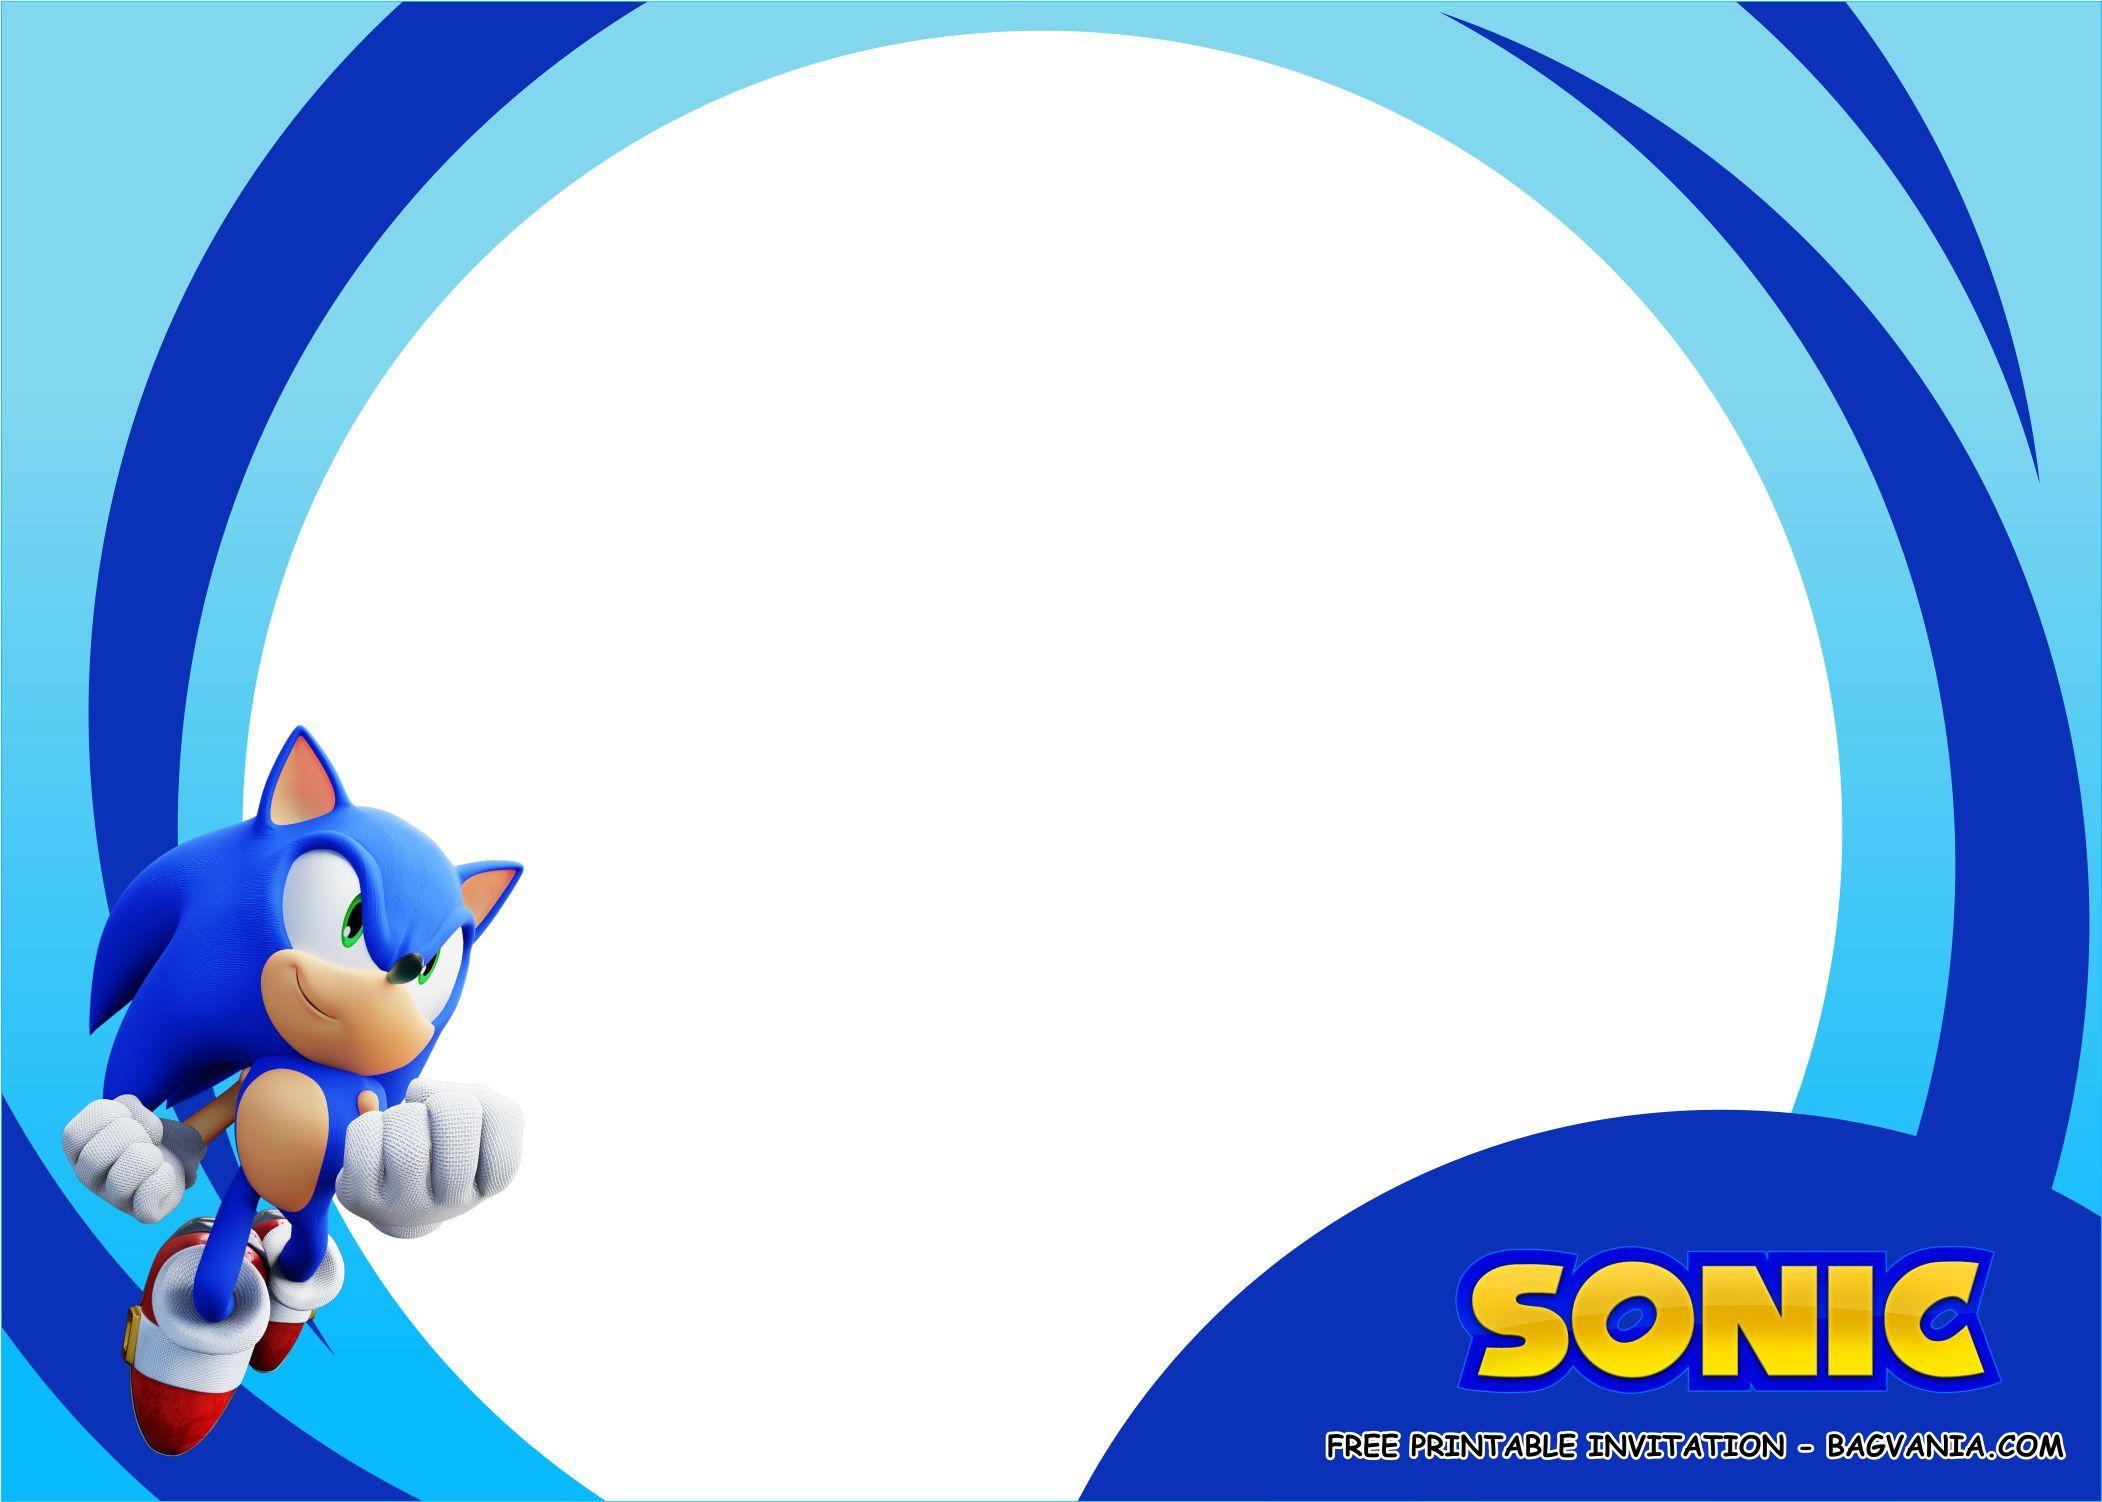 Free Printable Sonic The Hedgehog Birthday Party Kits Template Hedgehog Birthday Sonic Birthday Parties Birthday Party Kits